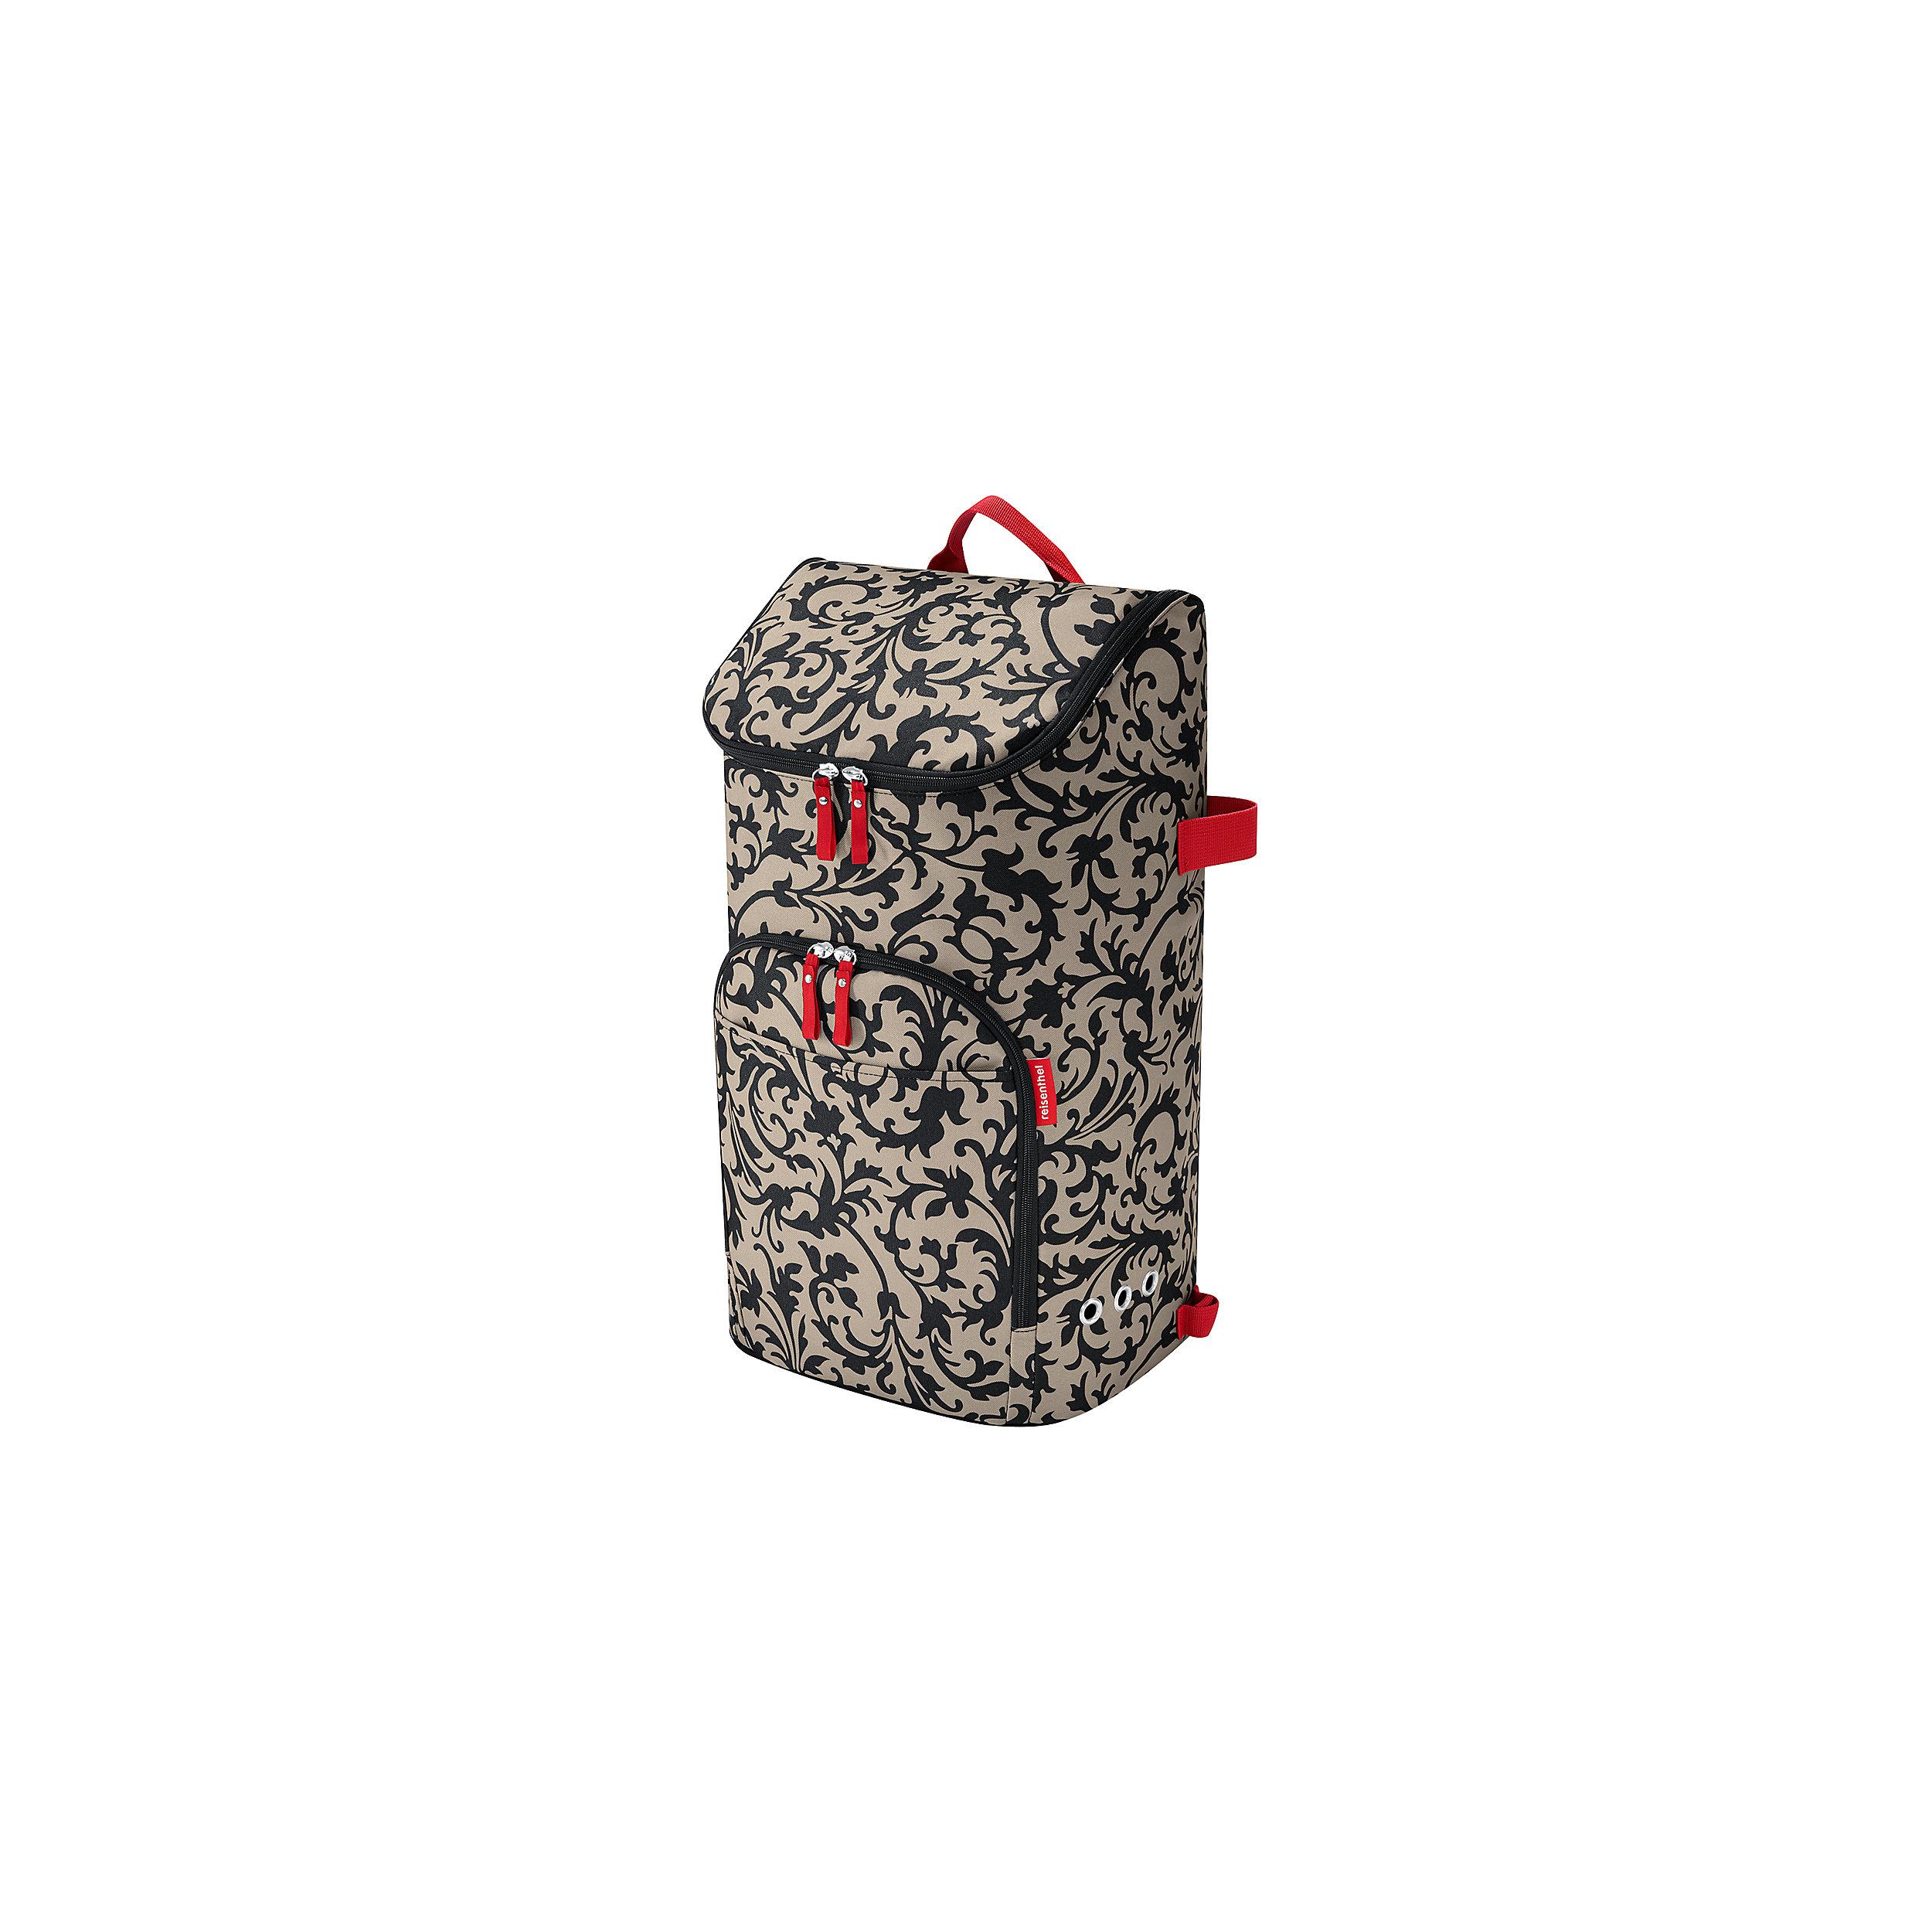 Citycruiser Bag Shopping 45 Liter